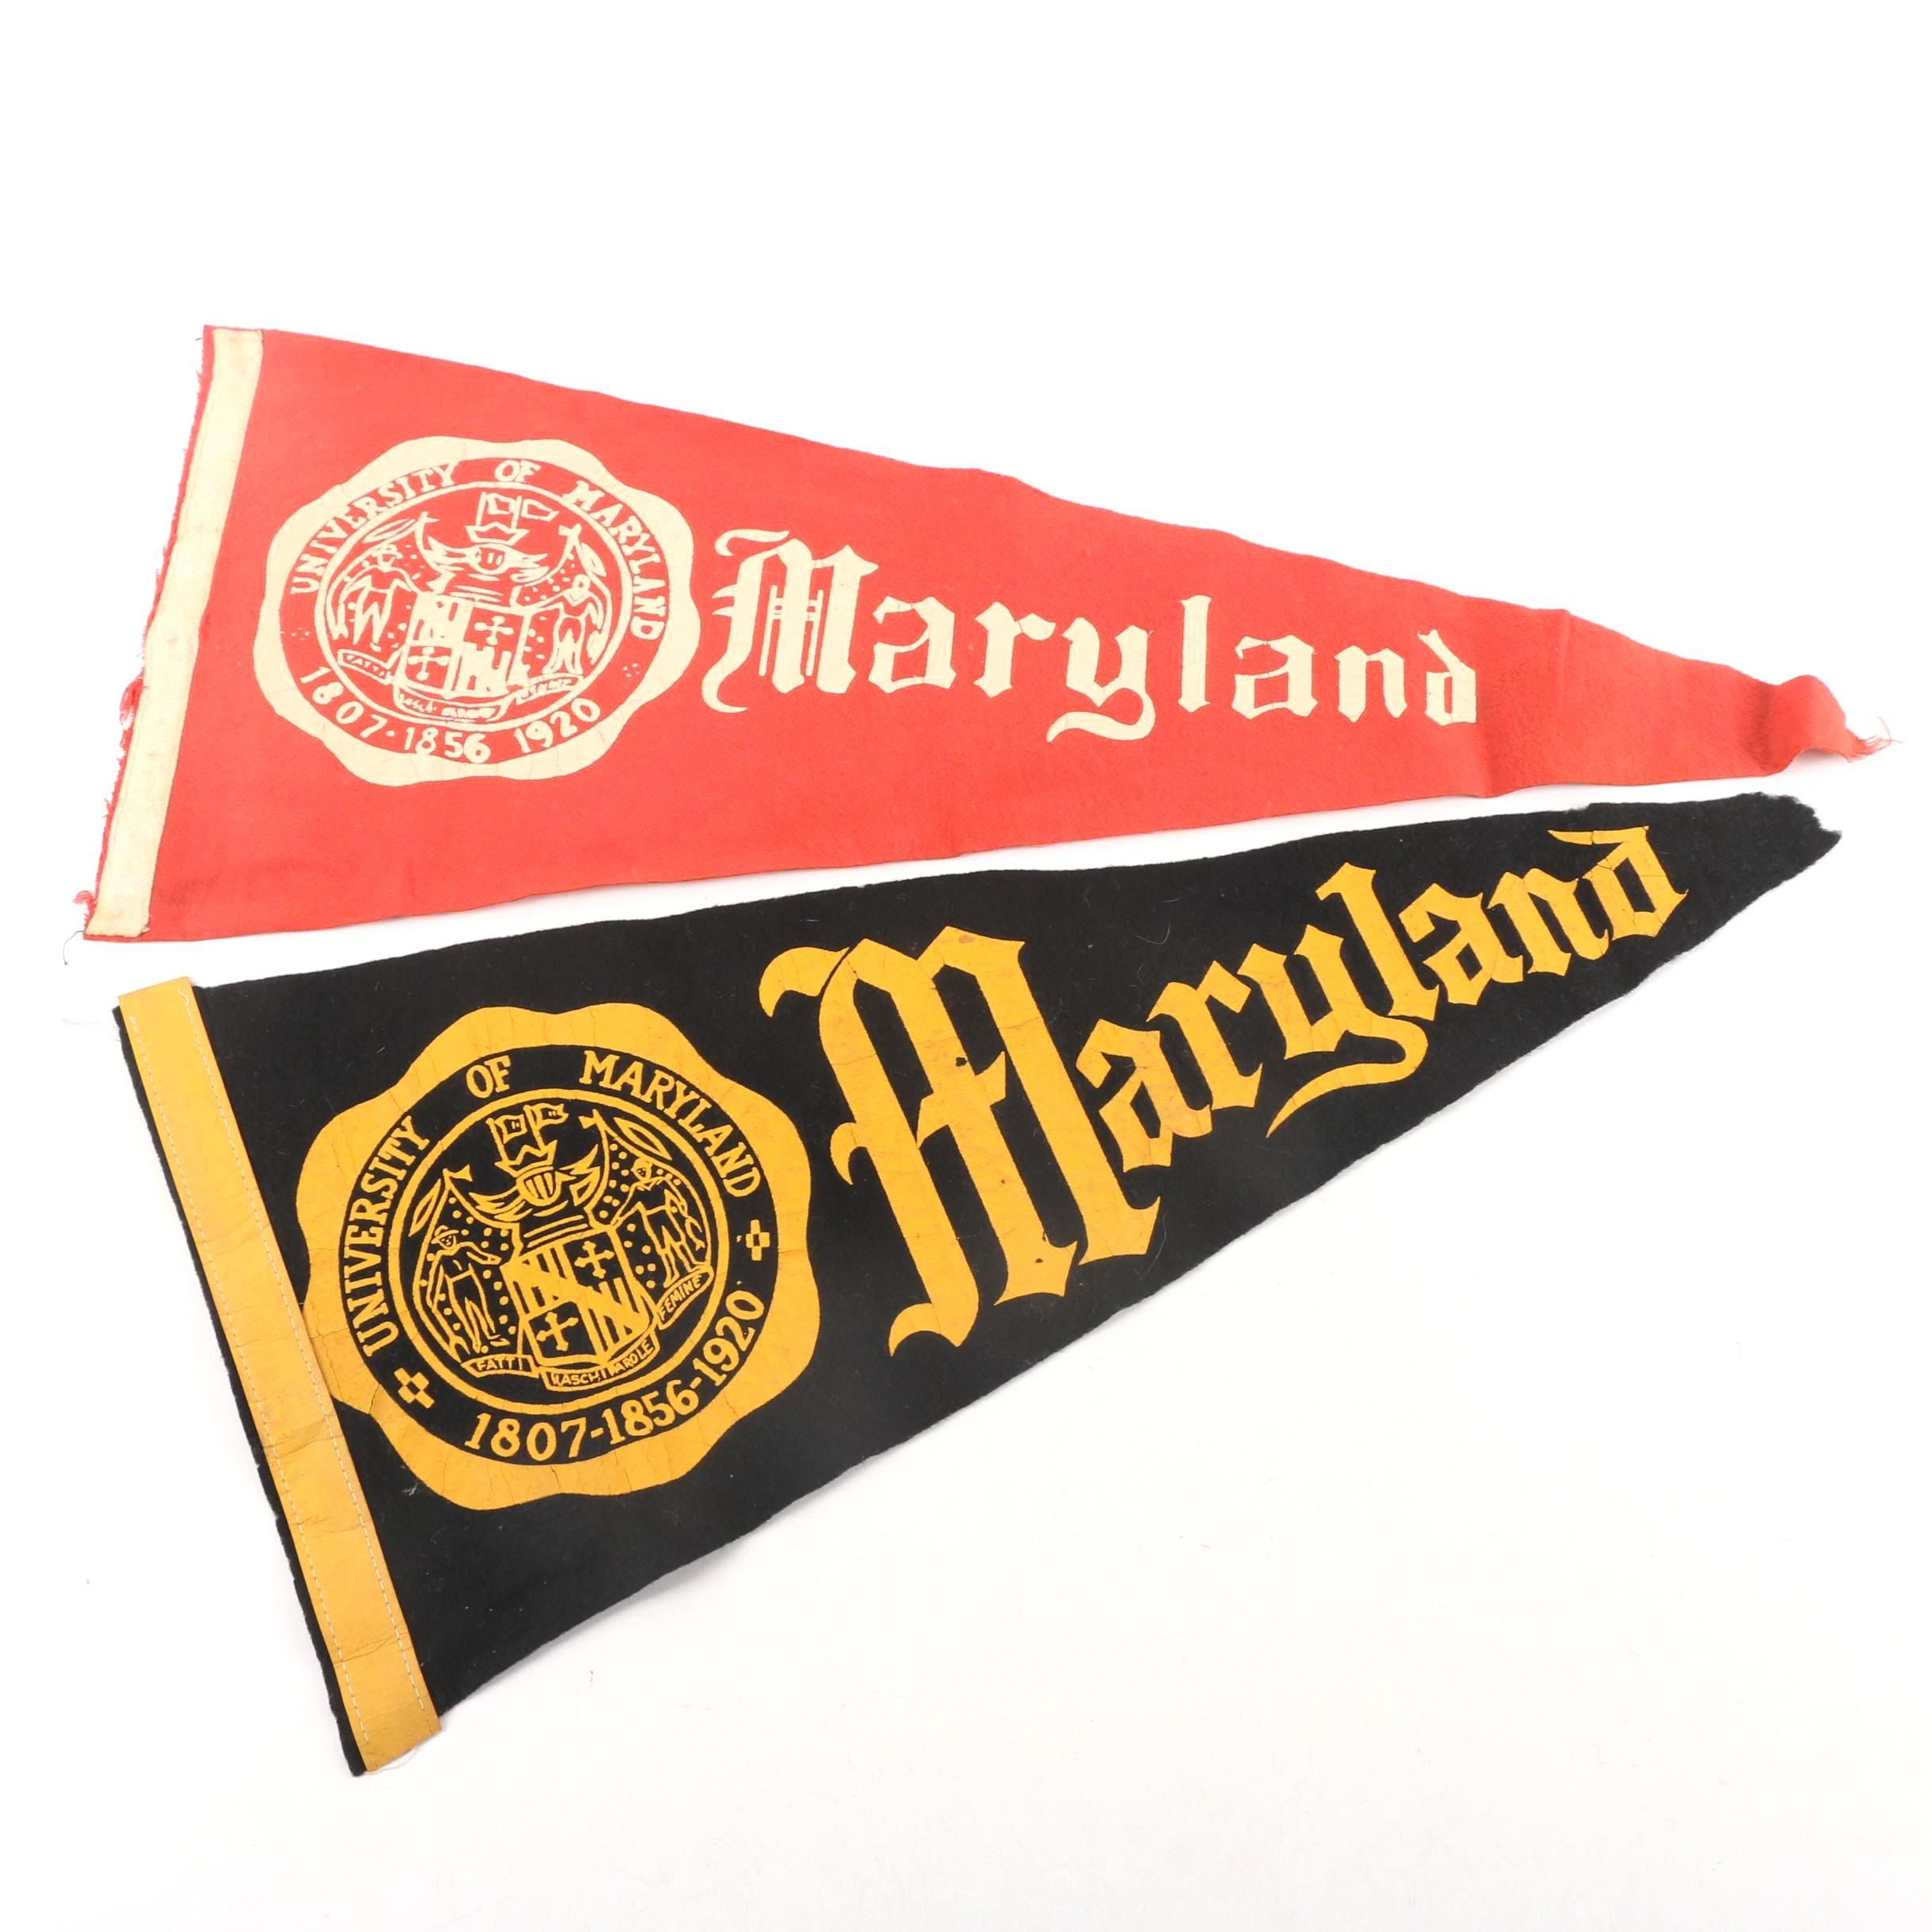 Vintage University of Maryland Felt Pennants